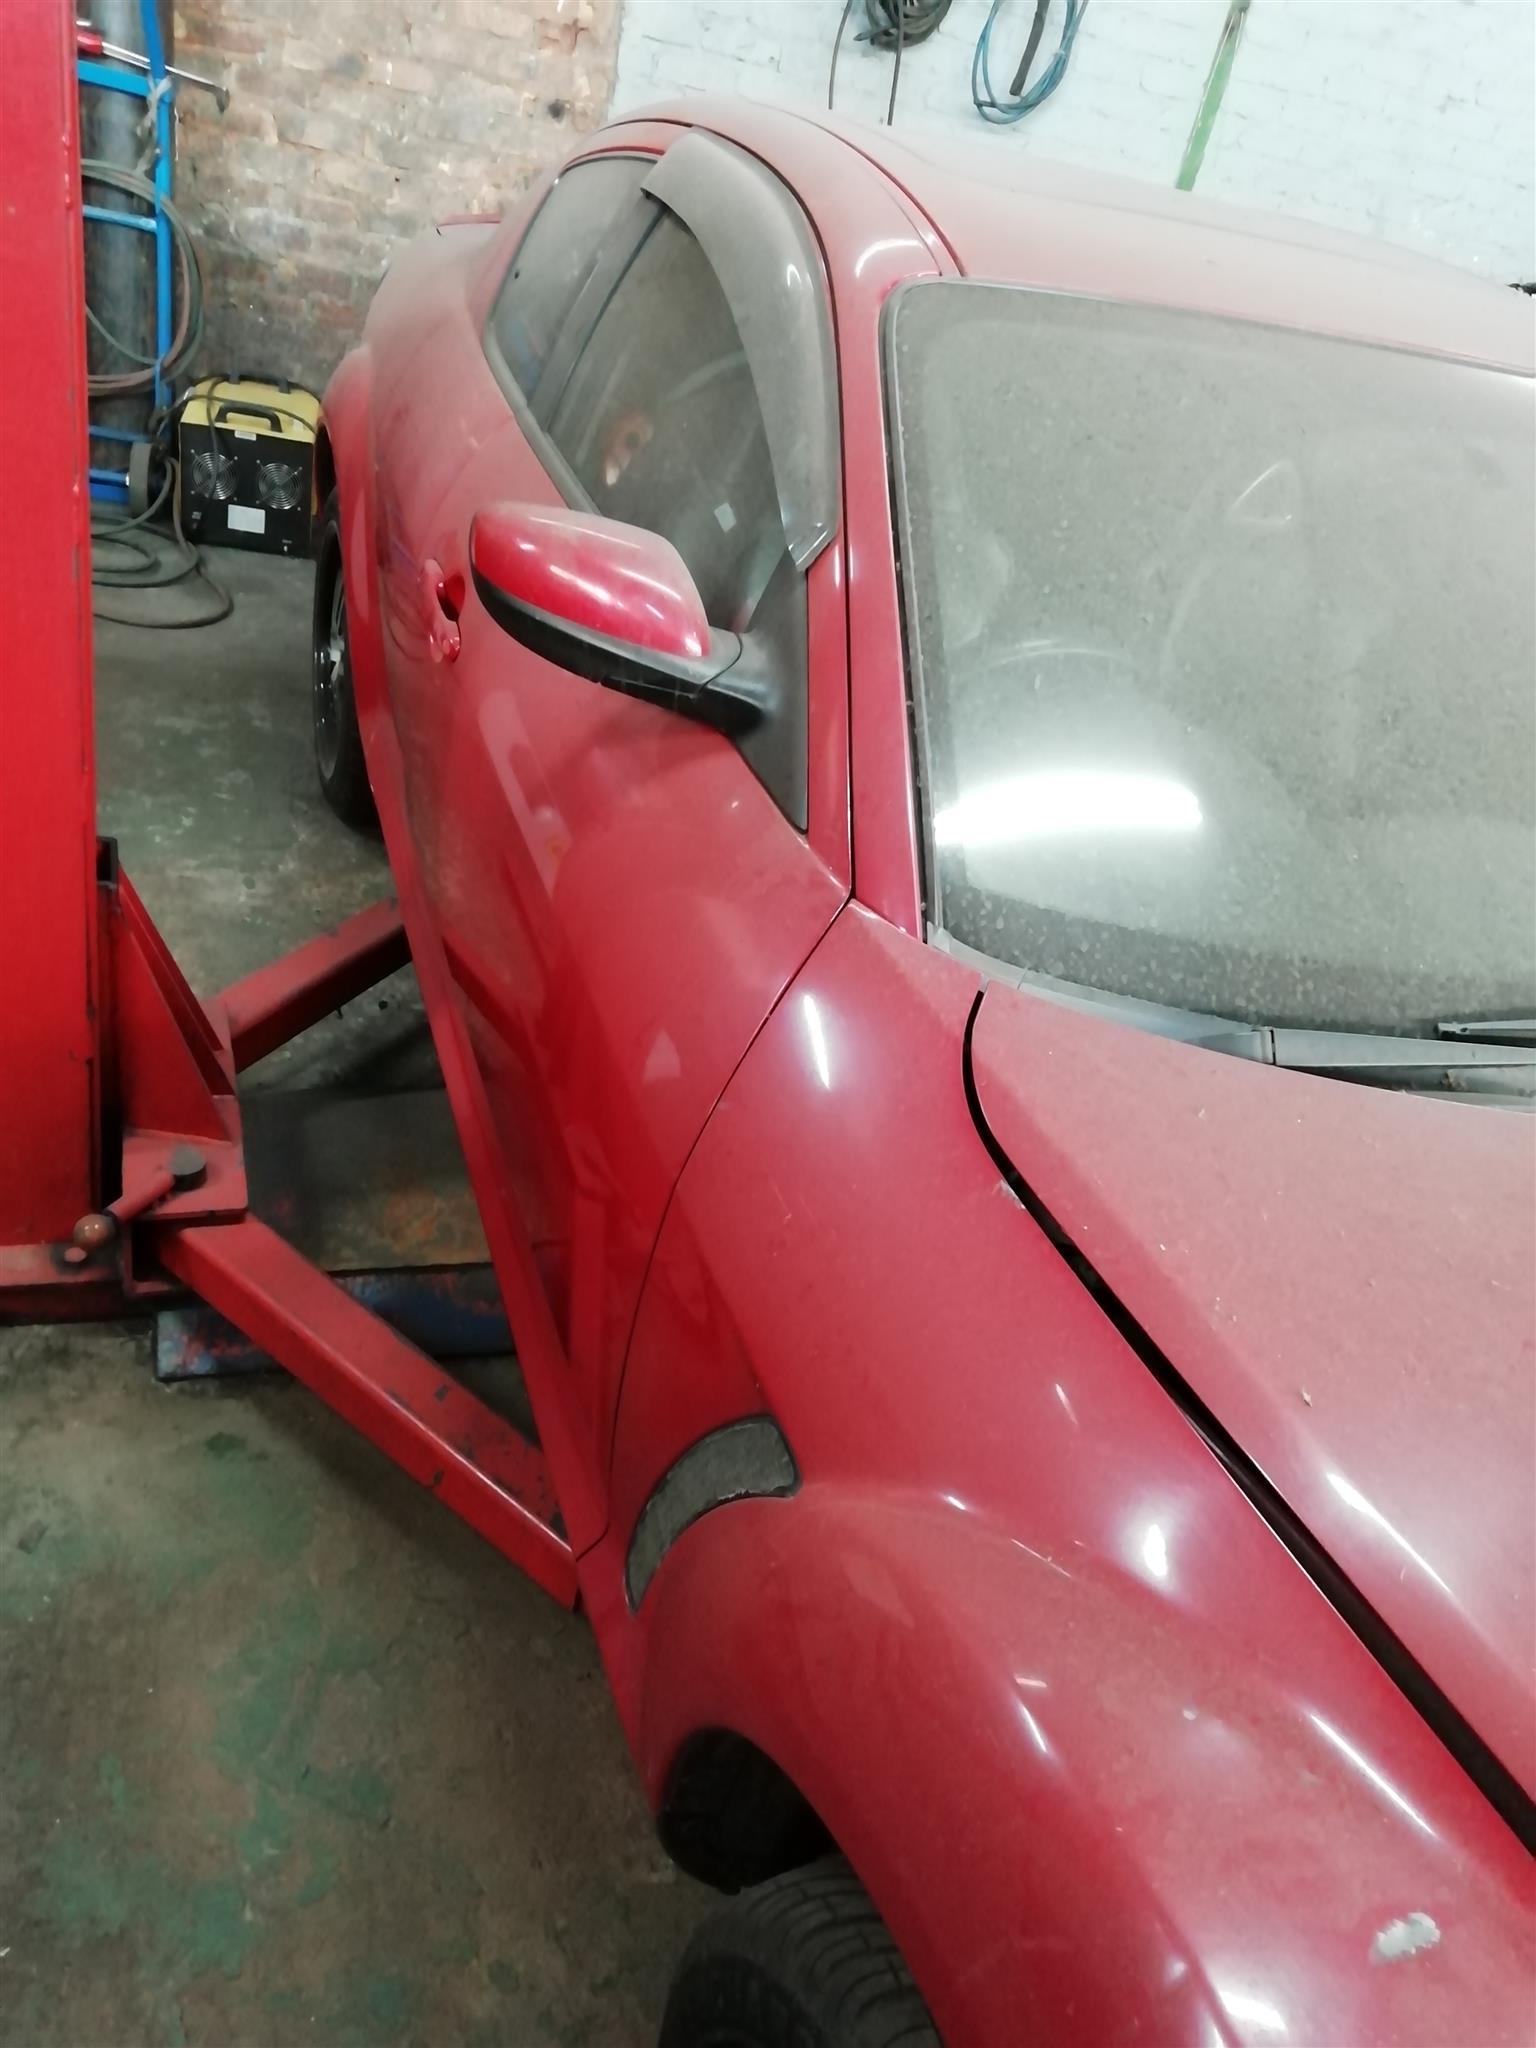 2008 Mazda RX-8 5 speed